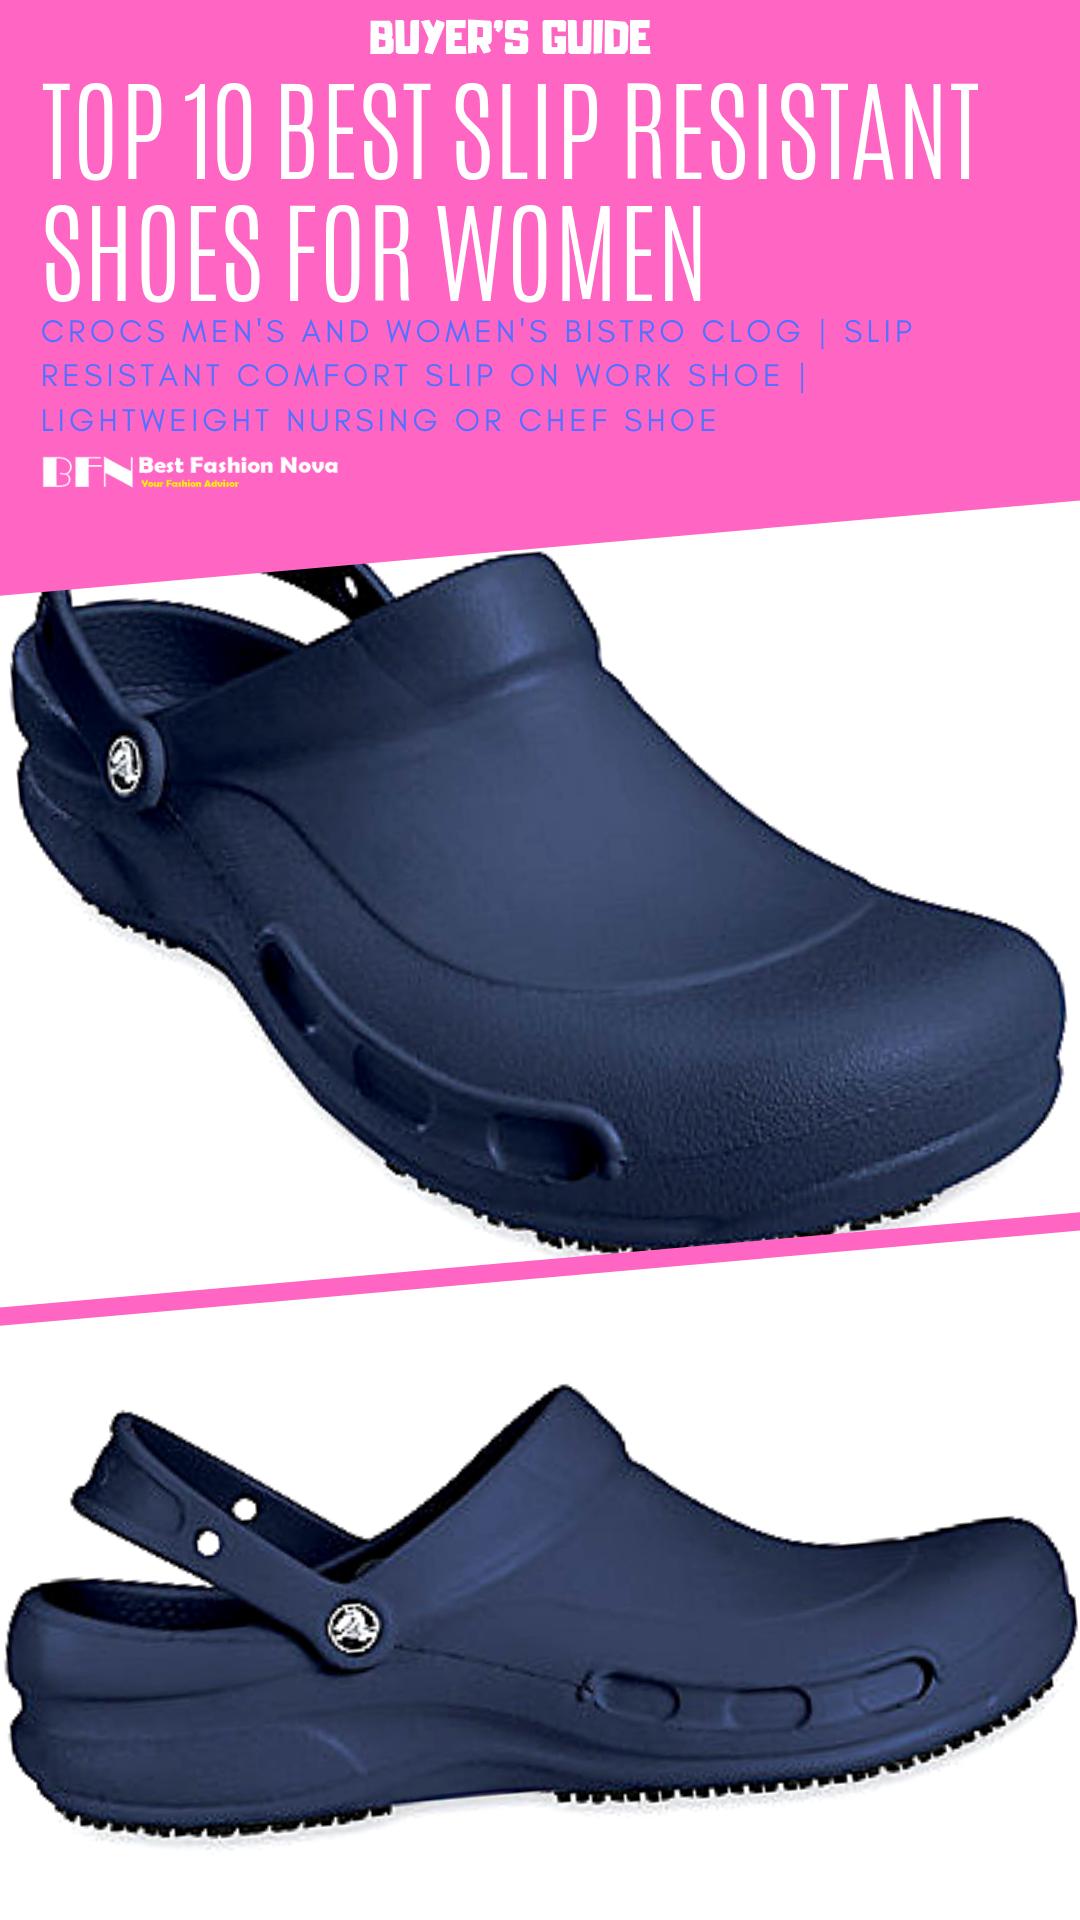 Best Slip Resistant Shoes for Women